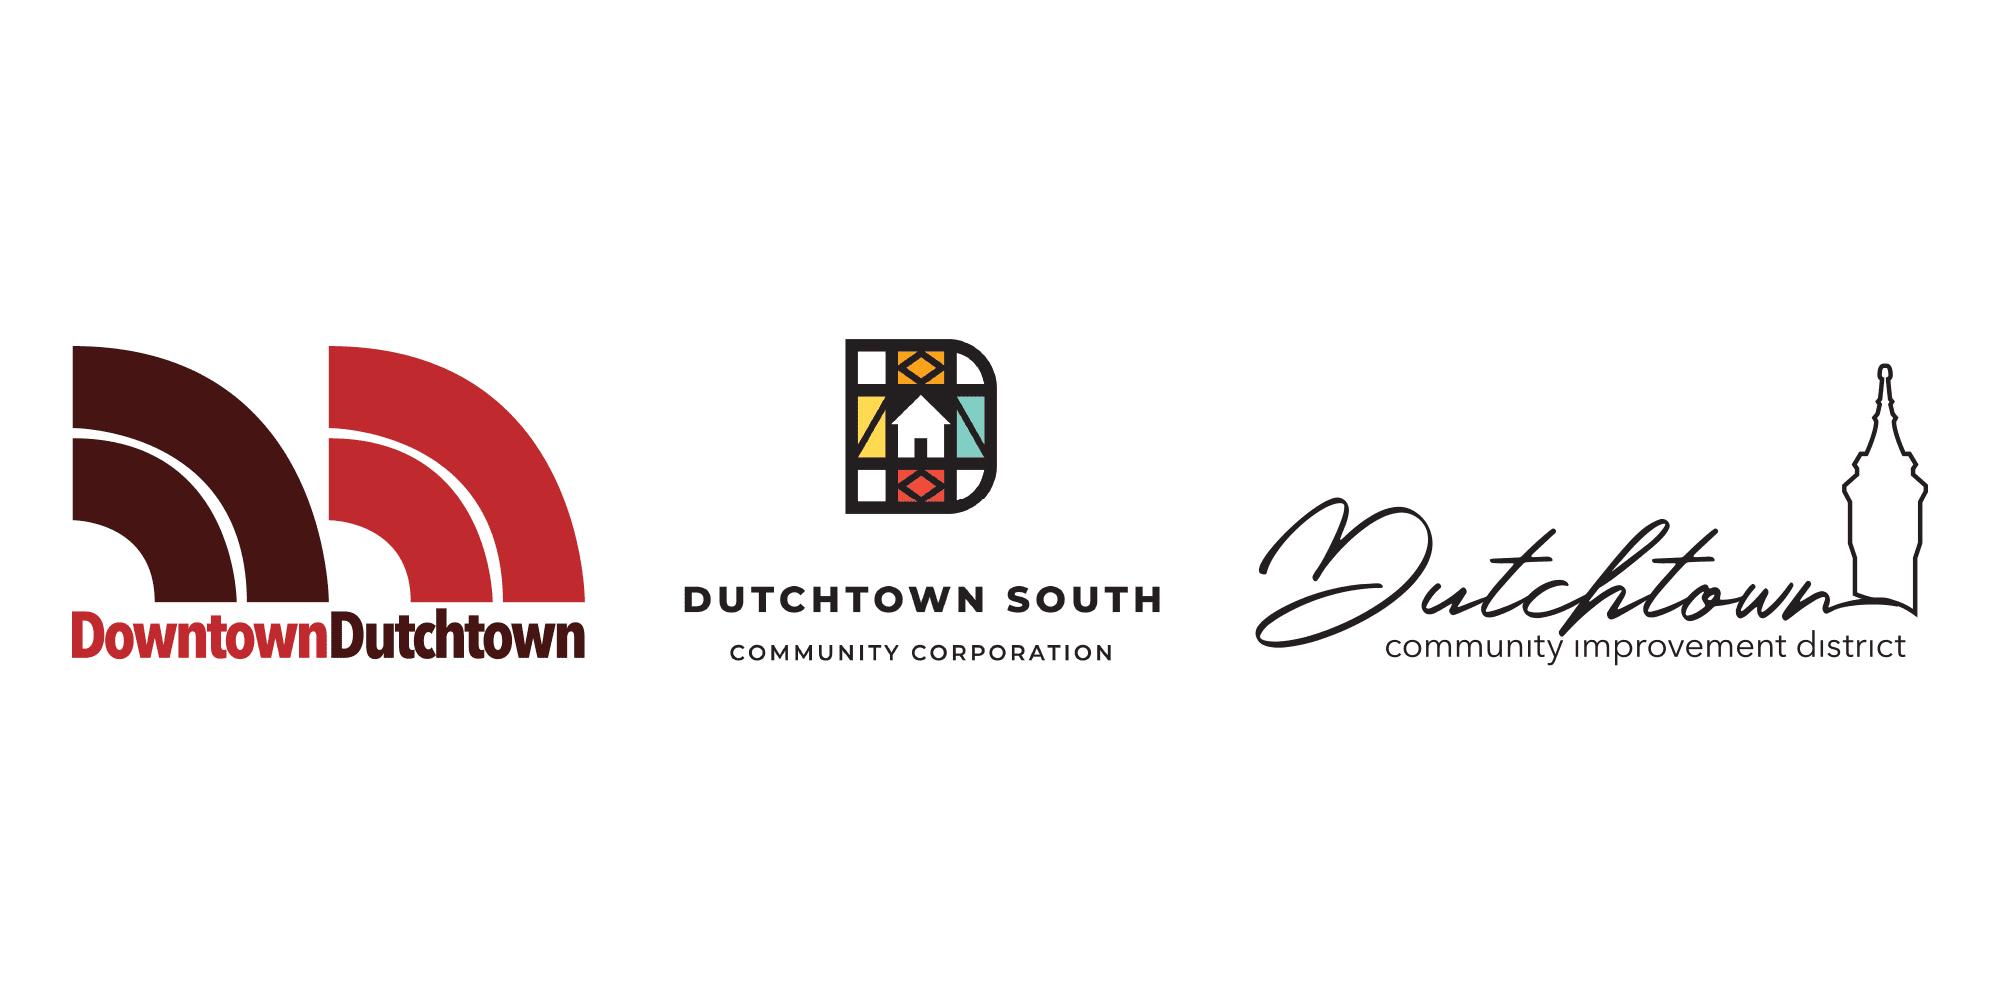 Downtown Dutchtown, Dutchtown South Community Corporation, and Dutchtown Community Improvement District logos.